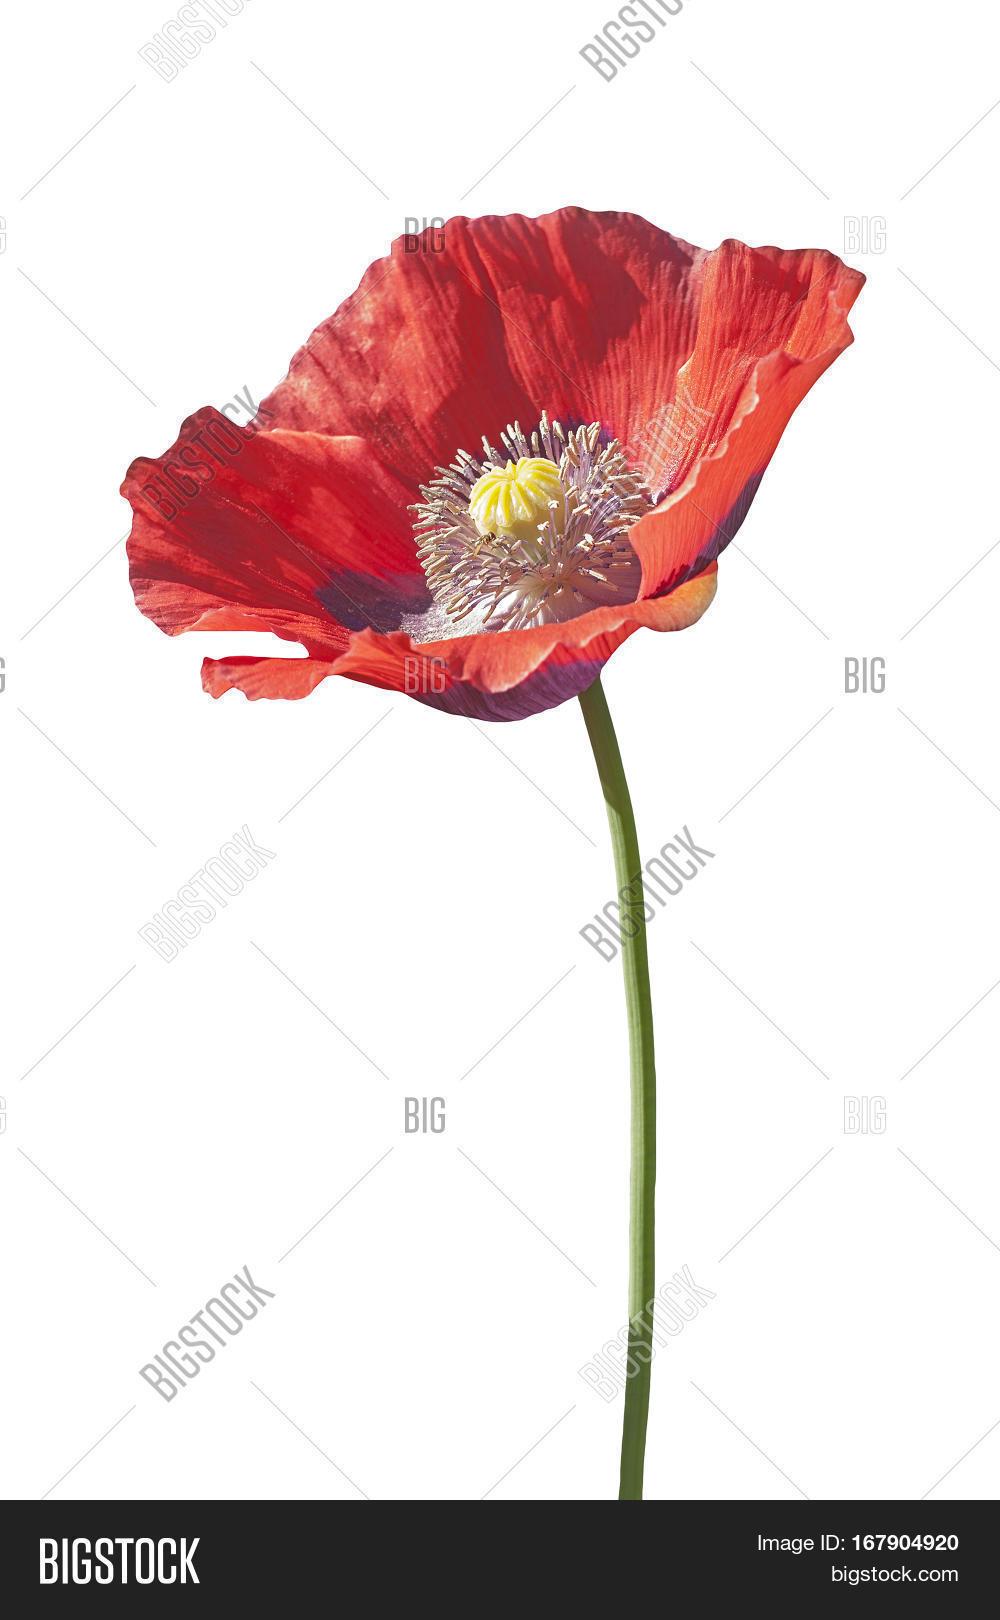 Opium Poppy Flower Image Photo Free Trial Bigstock